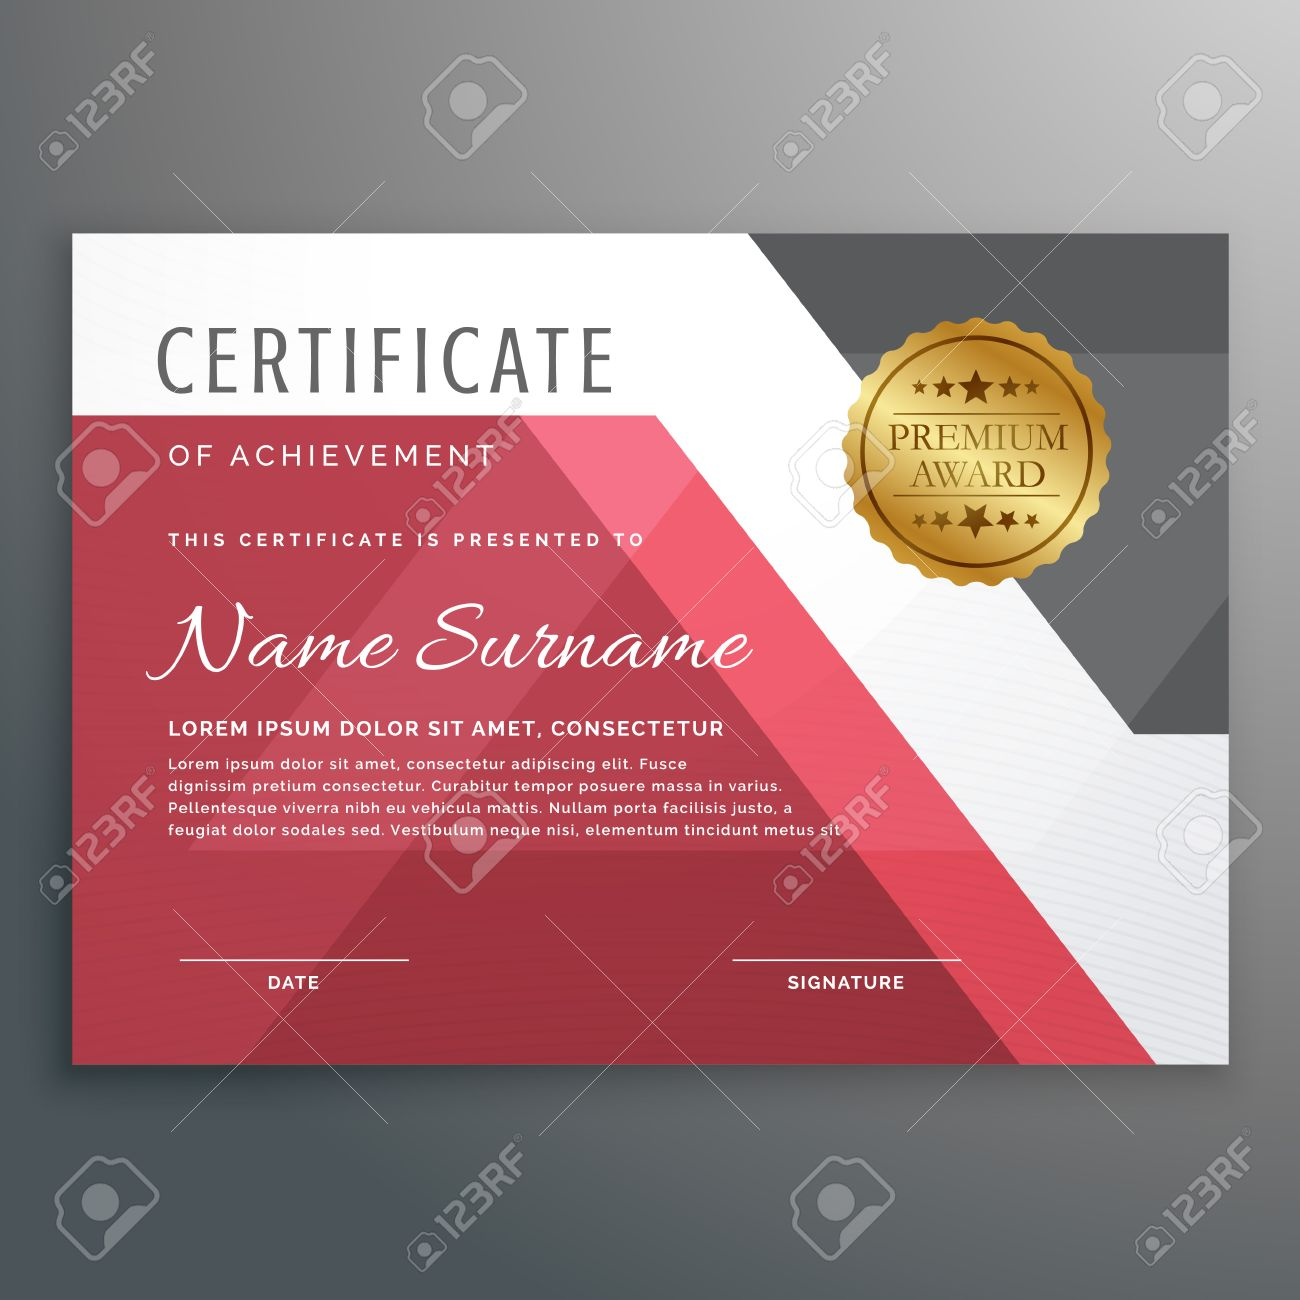 Elegant certificate template with geometric shapes royalty free elegant certificate template with geometric shapes stock vector 63828321 xflitez Image collections